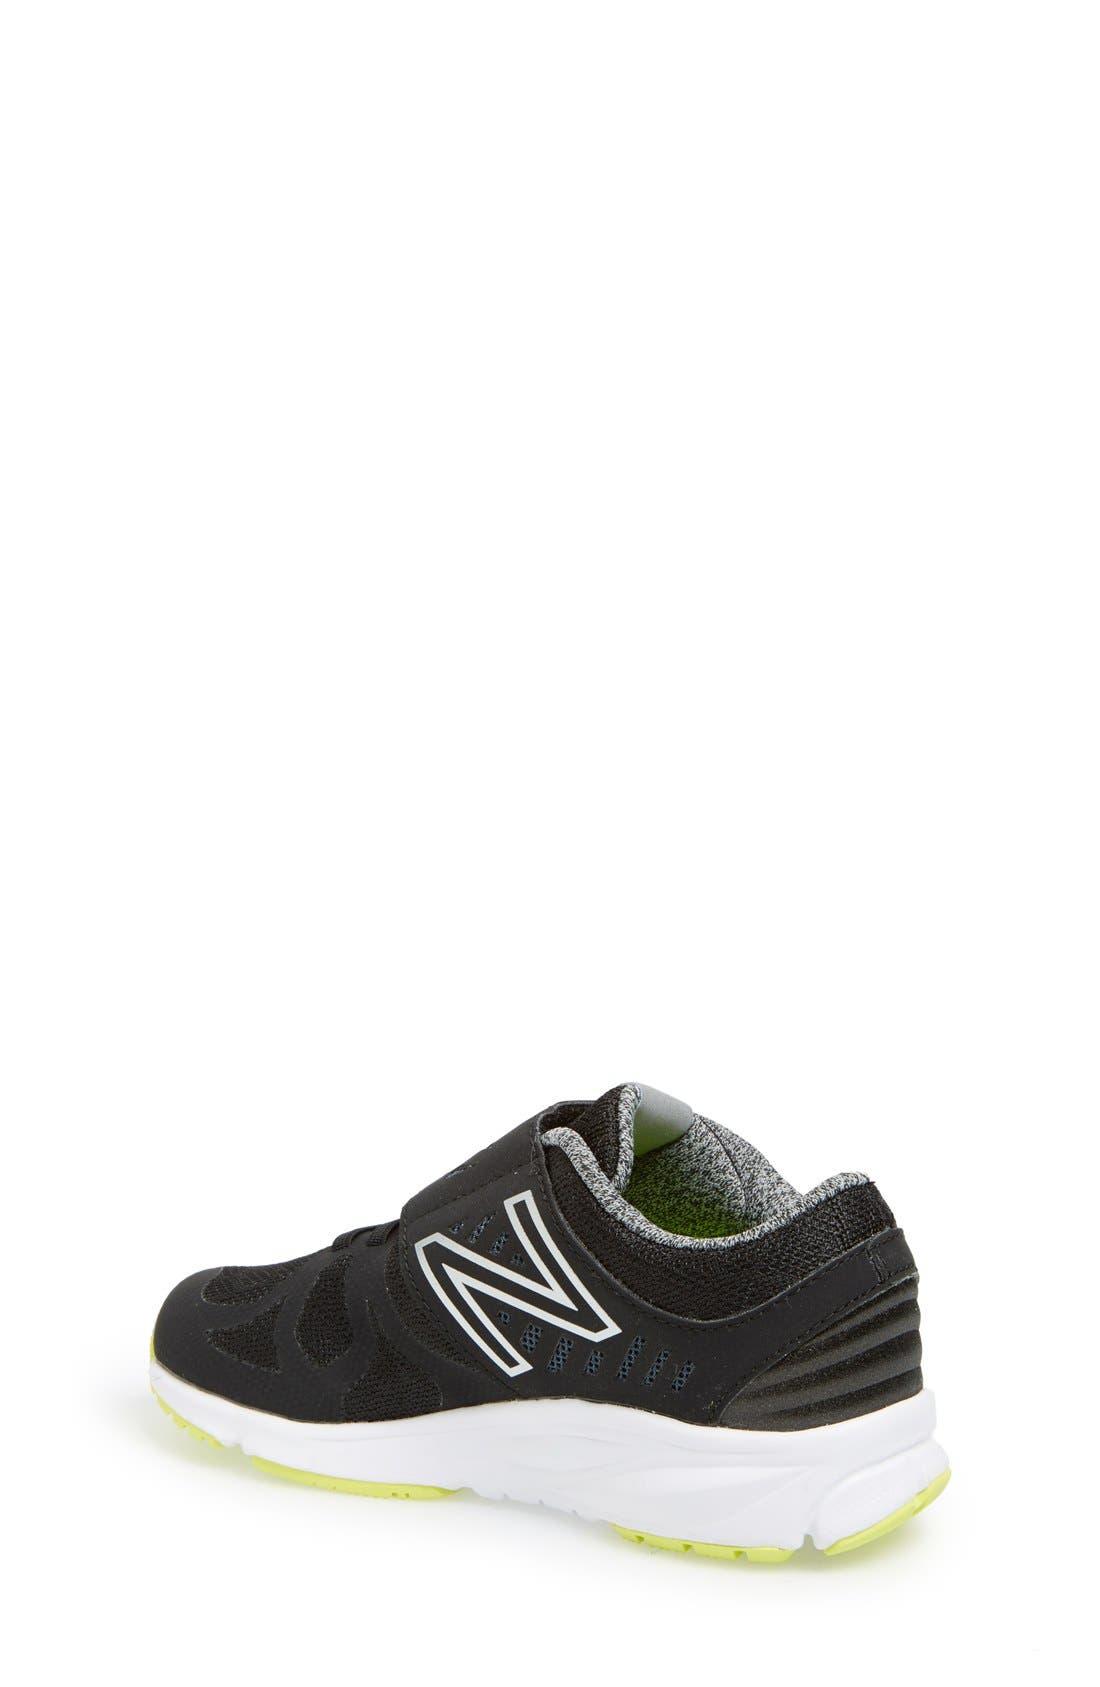 'Vazee Rush 200' Athletic Shoe,                             Alternate thumbnail 4, color,                             001